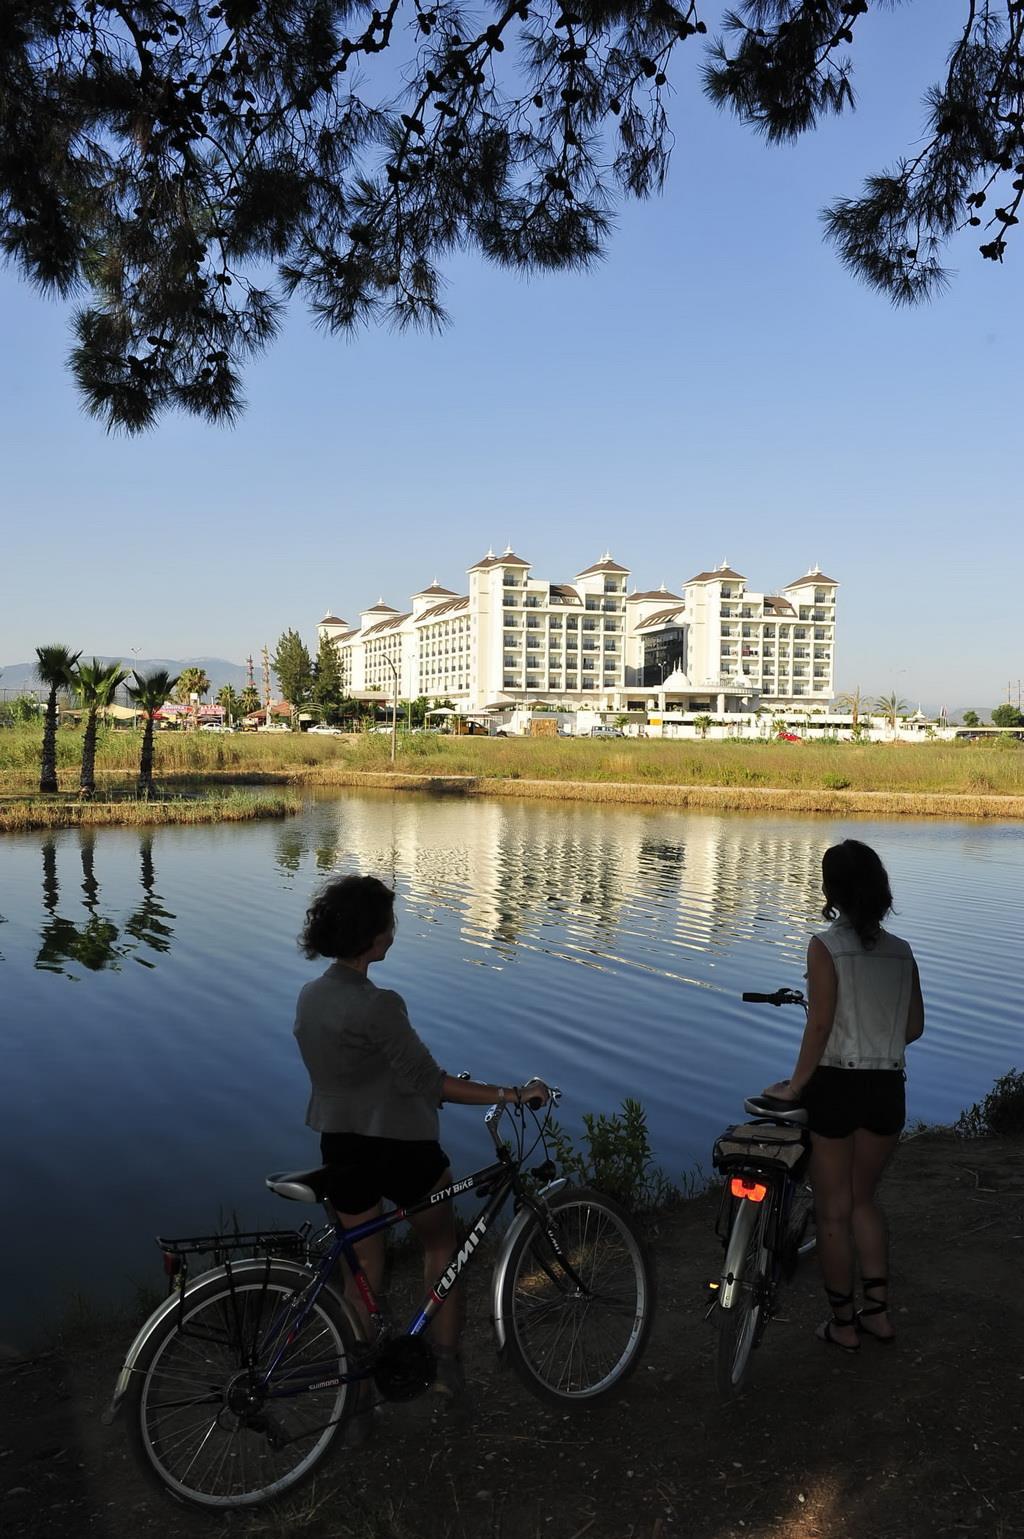 lake-river-side-hotel-general-087.jpg